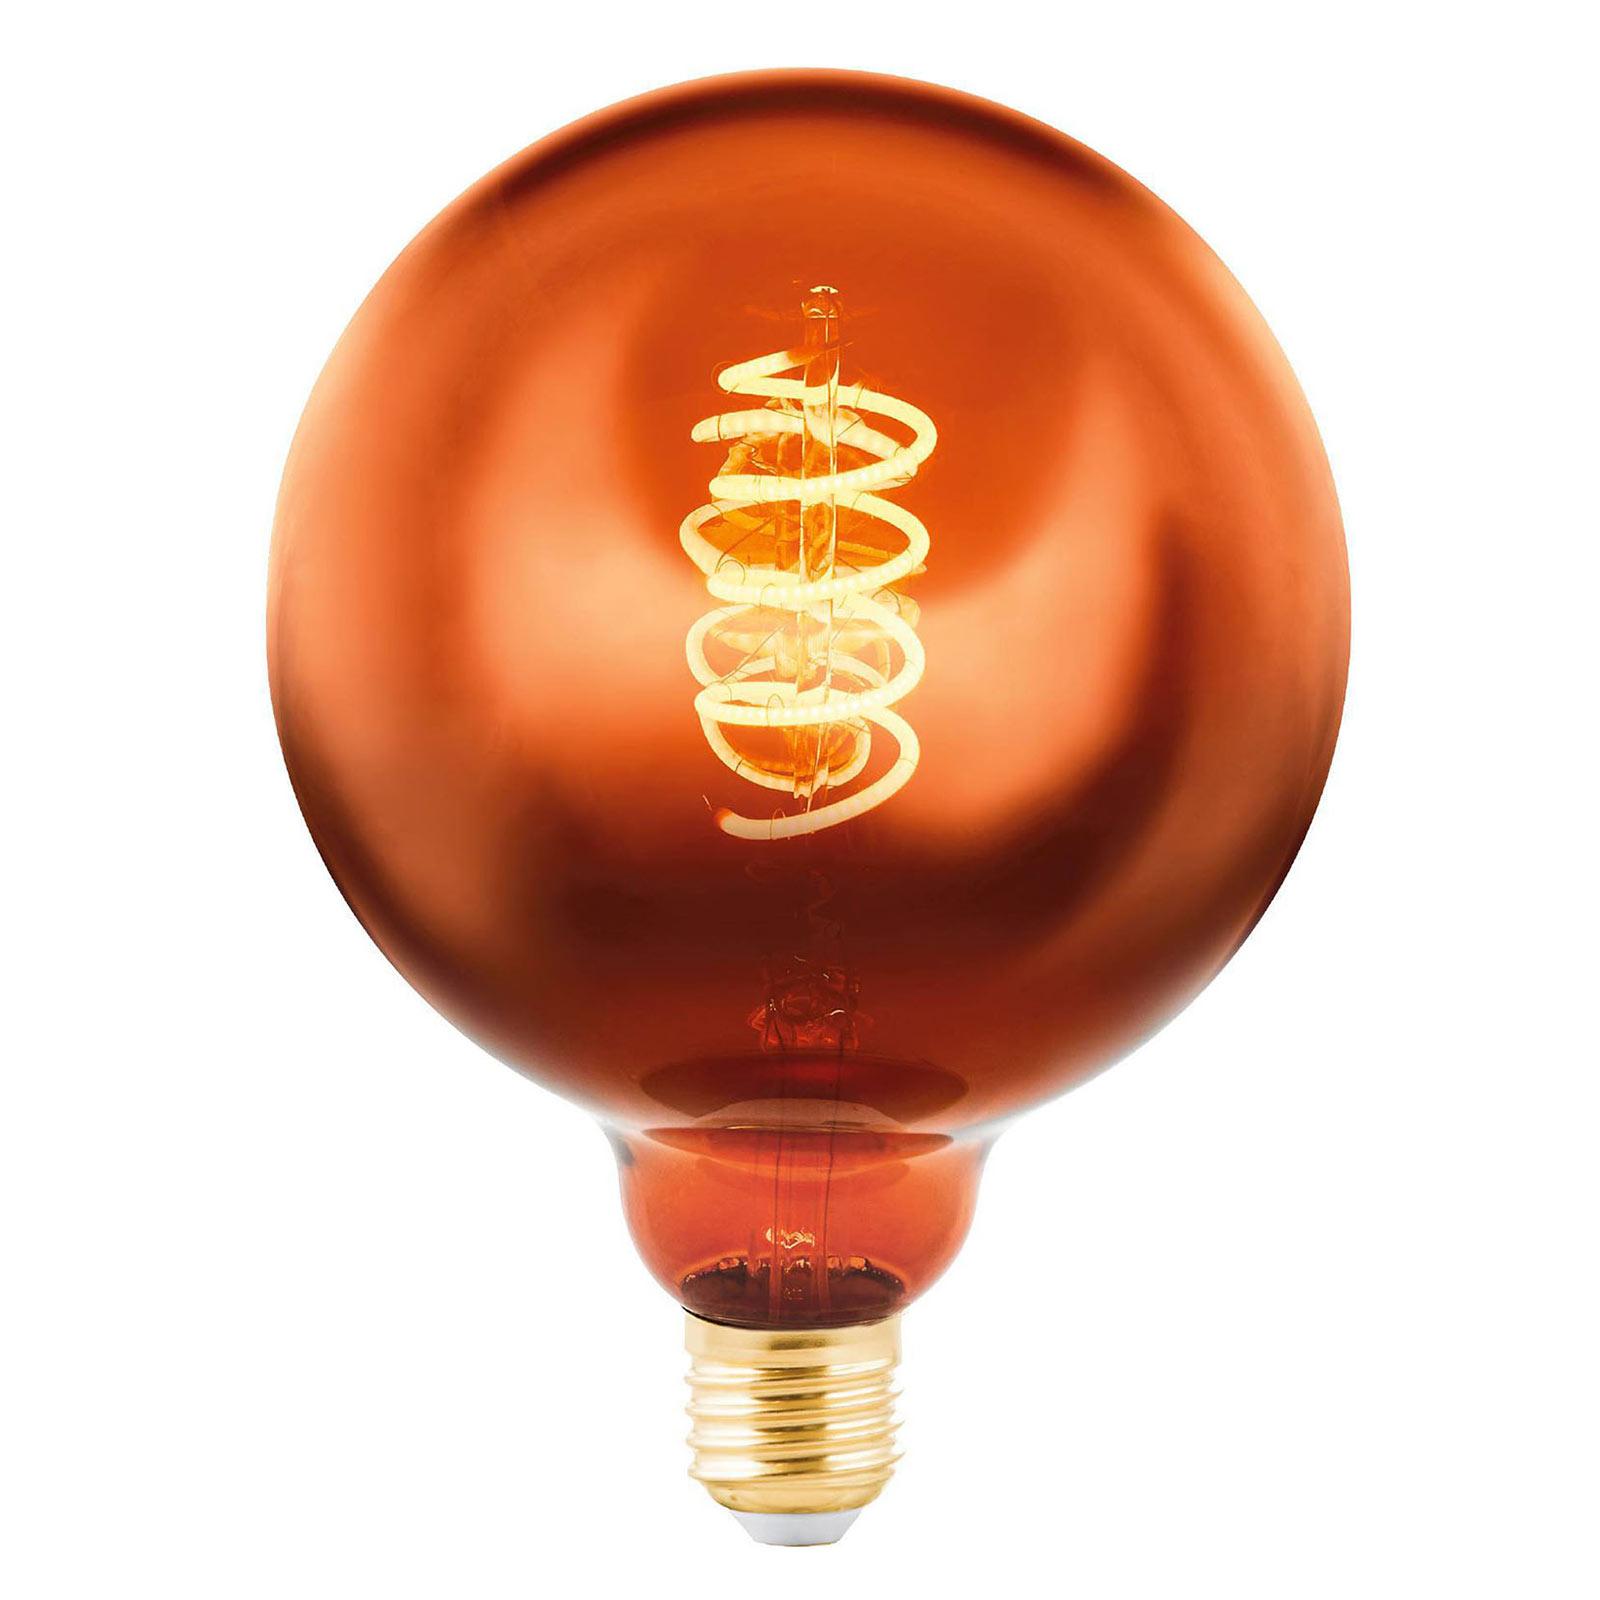 LED-Globelampe E27 4W kupfer bedampft Ø 12,5 cm